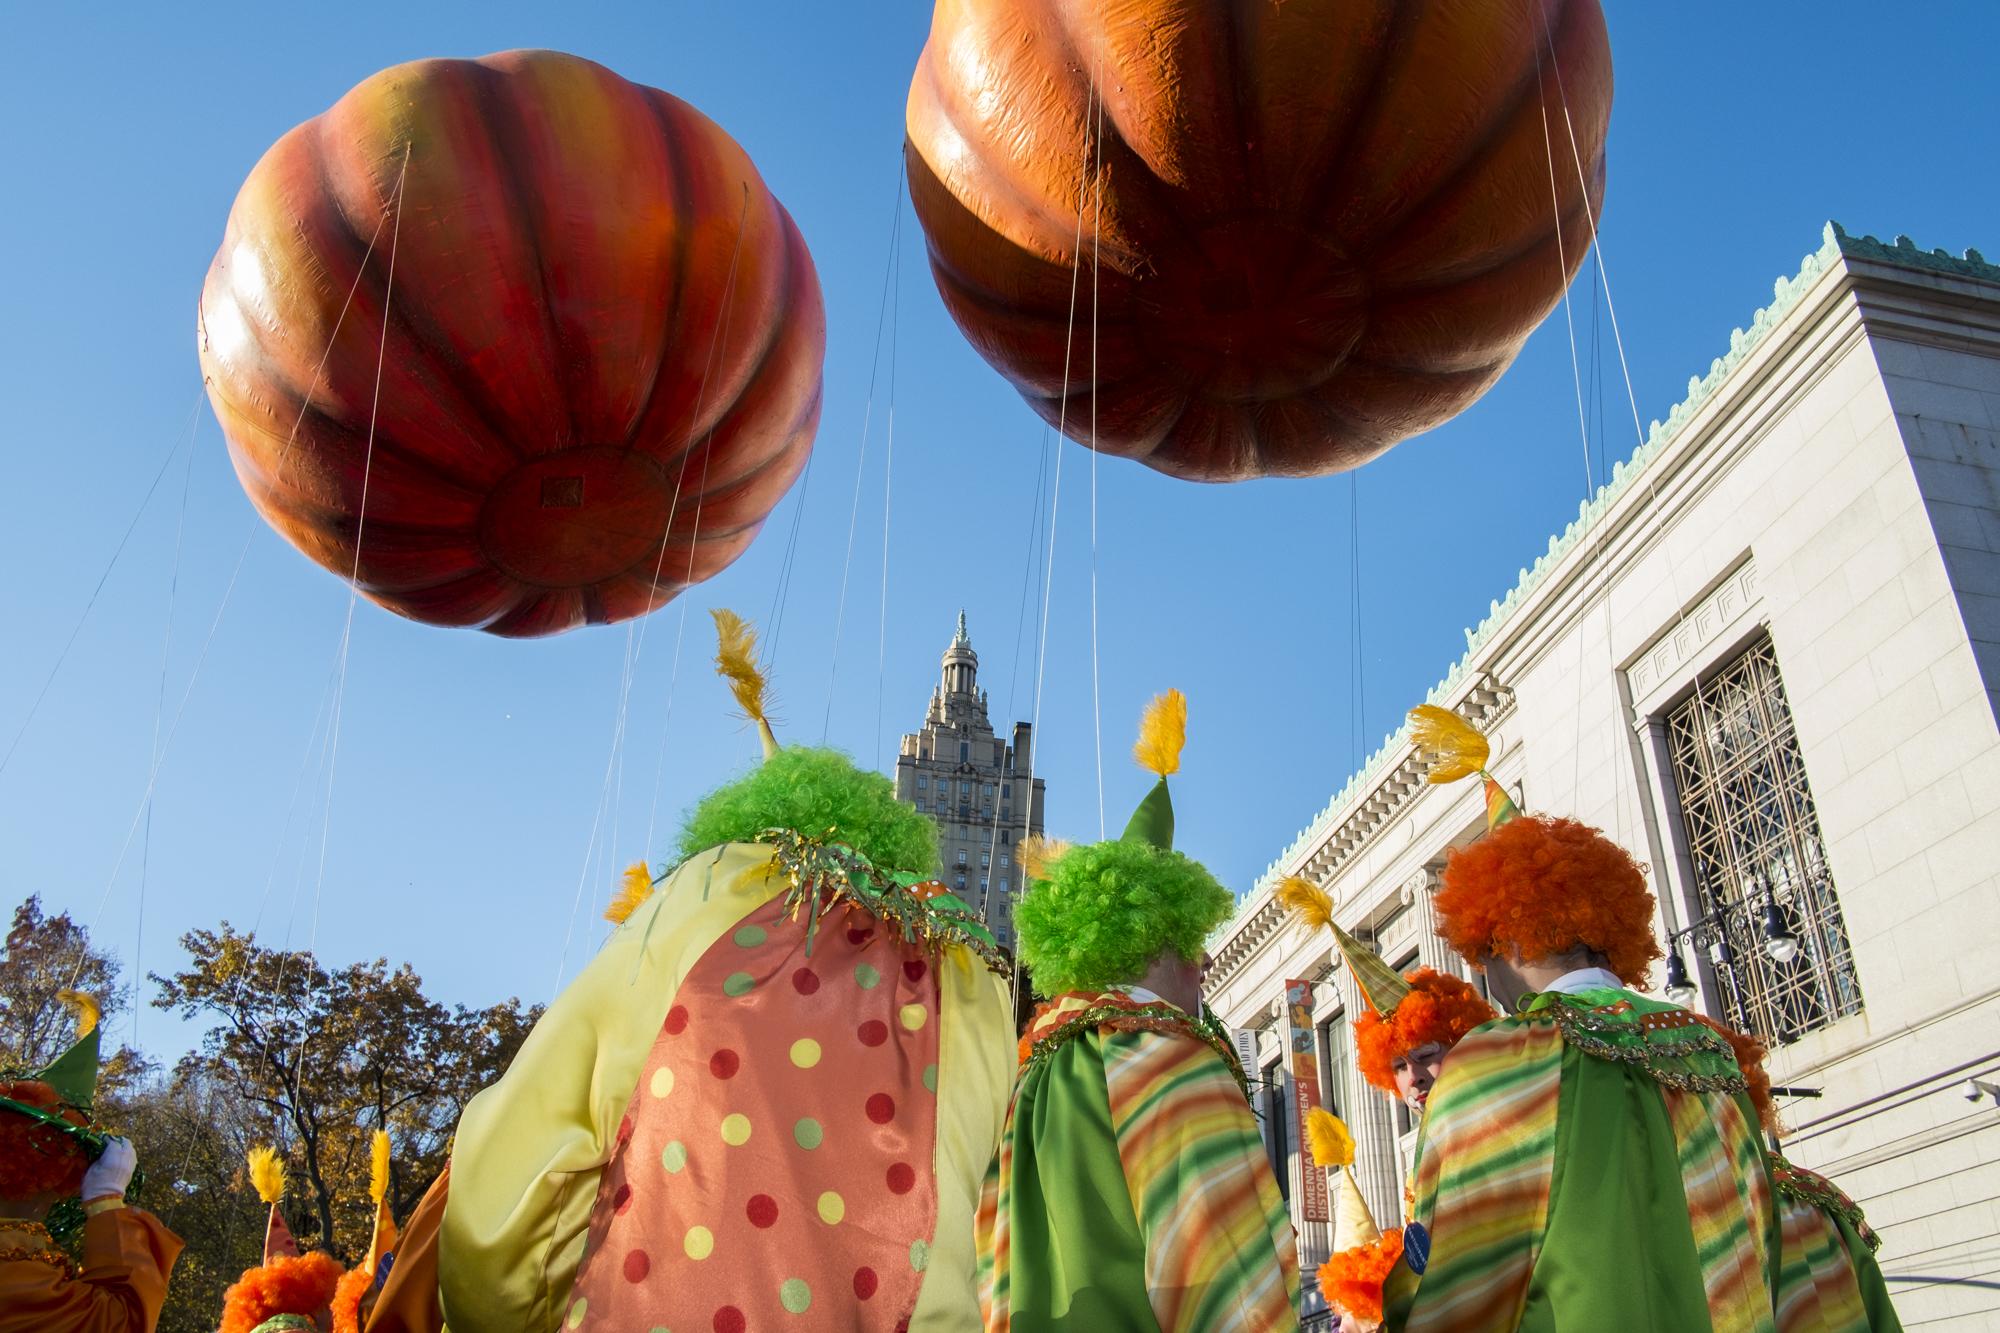 Macys-Thanksgiving-Day-Parade-5.jpg